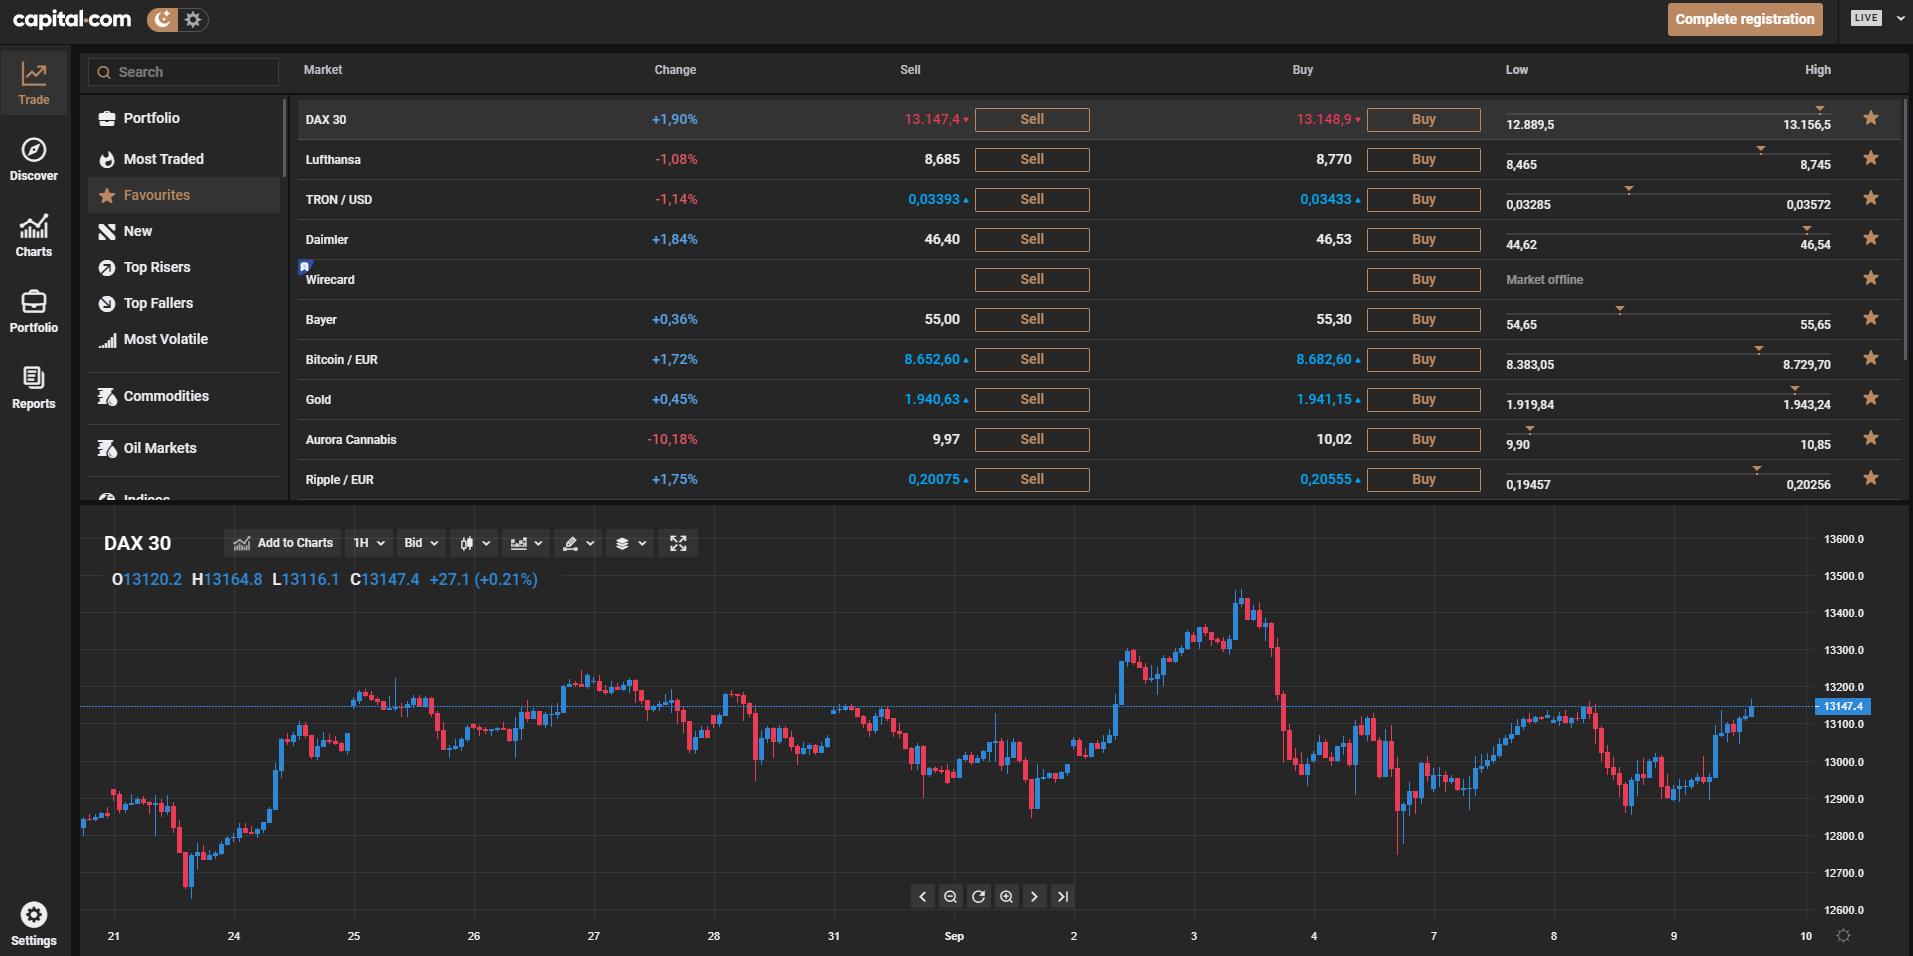 Capital.com Trading Plattform Screenshot